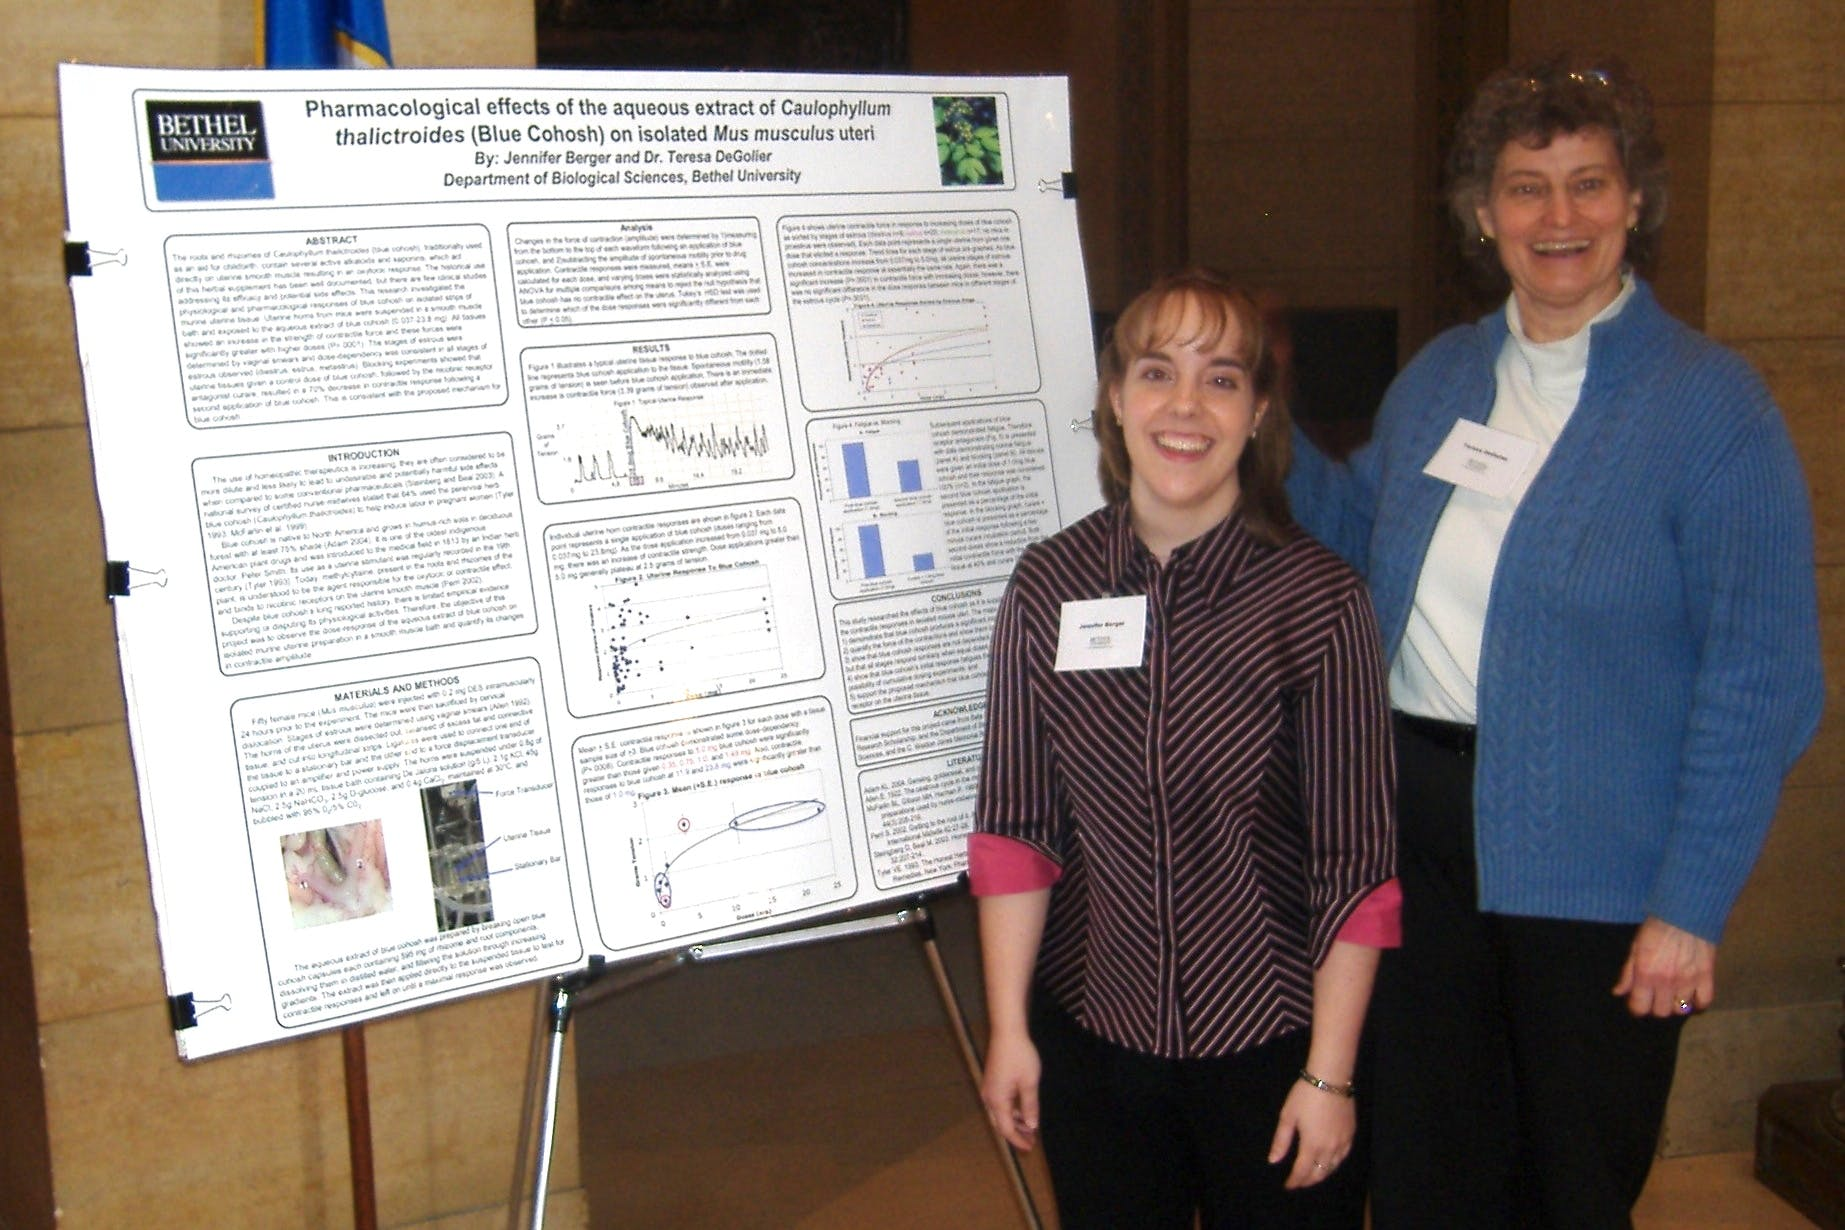 Jennifer Berger '07 and Professor of Biology Teresa DeGolier